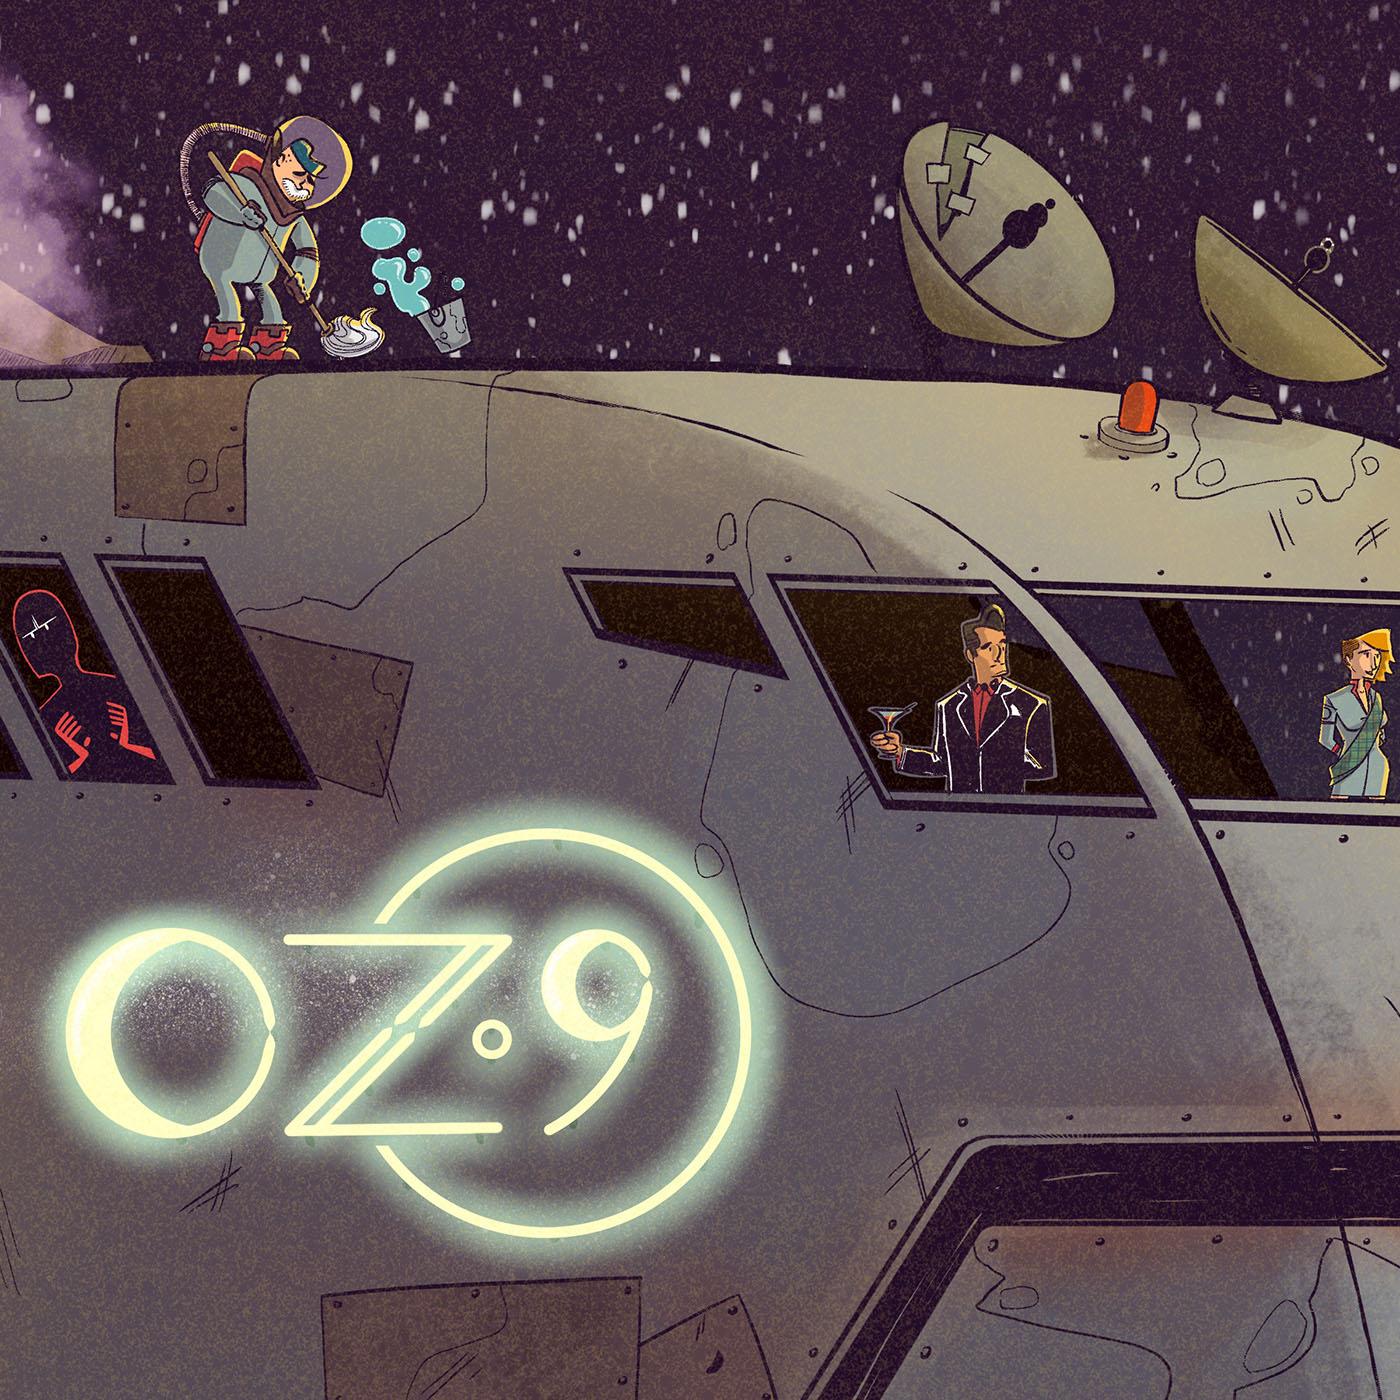 Oz 9 show art